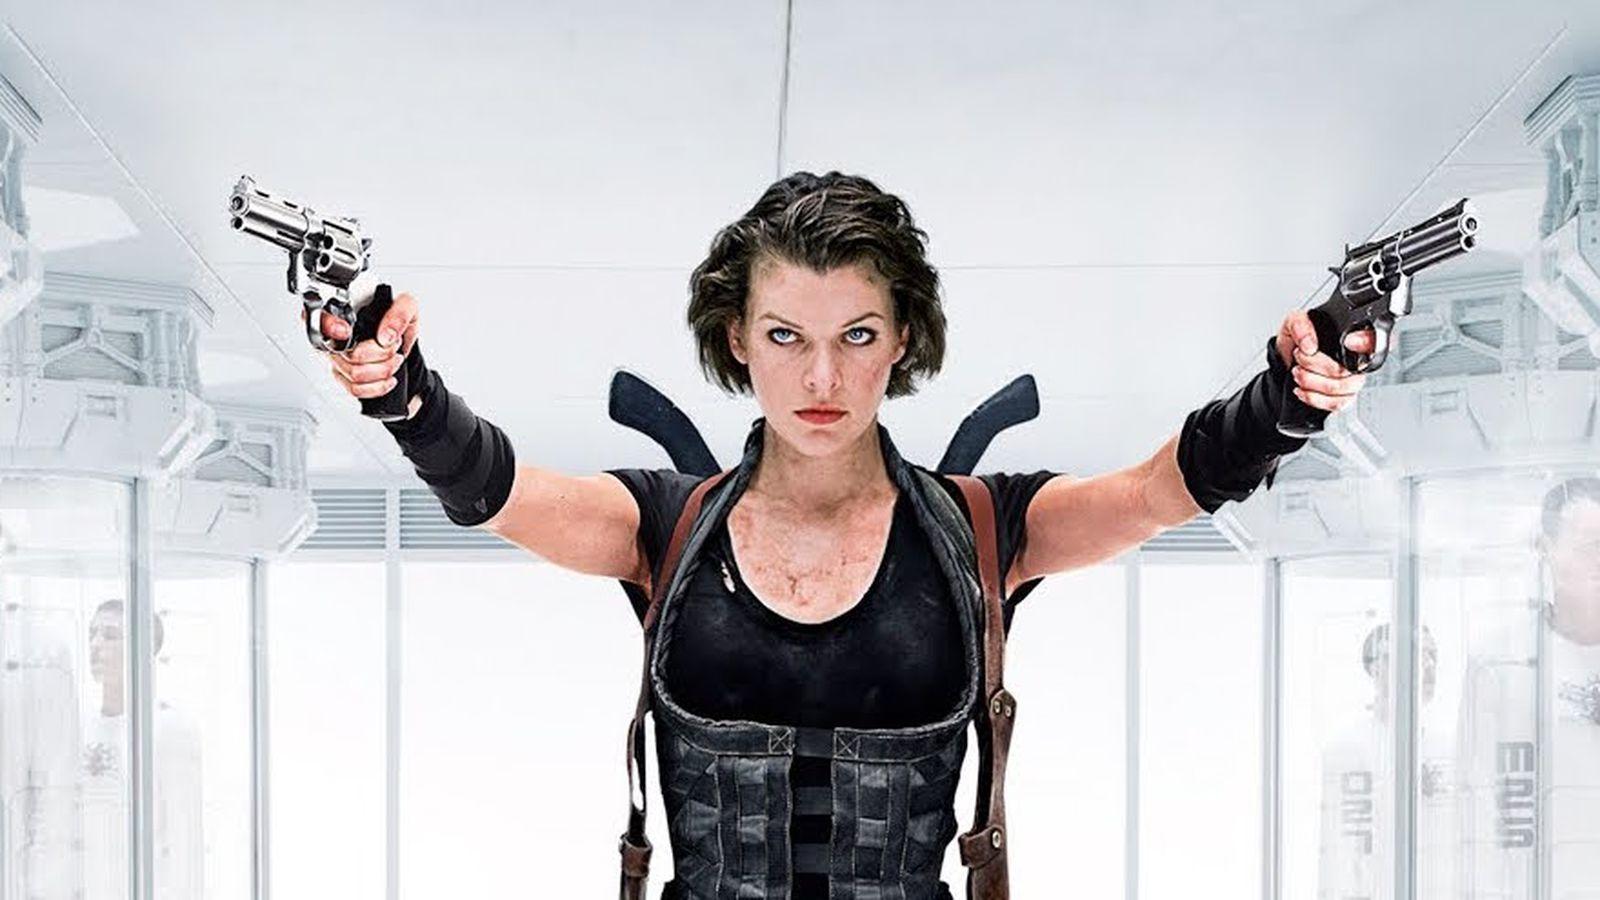 The Milla Jovovich Resident Evil Franchise A Retrospective The